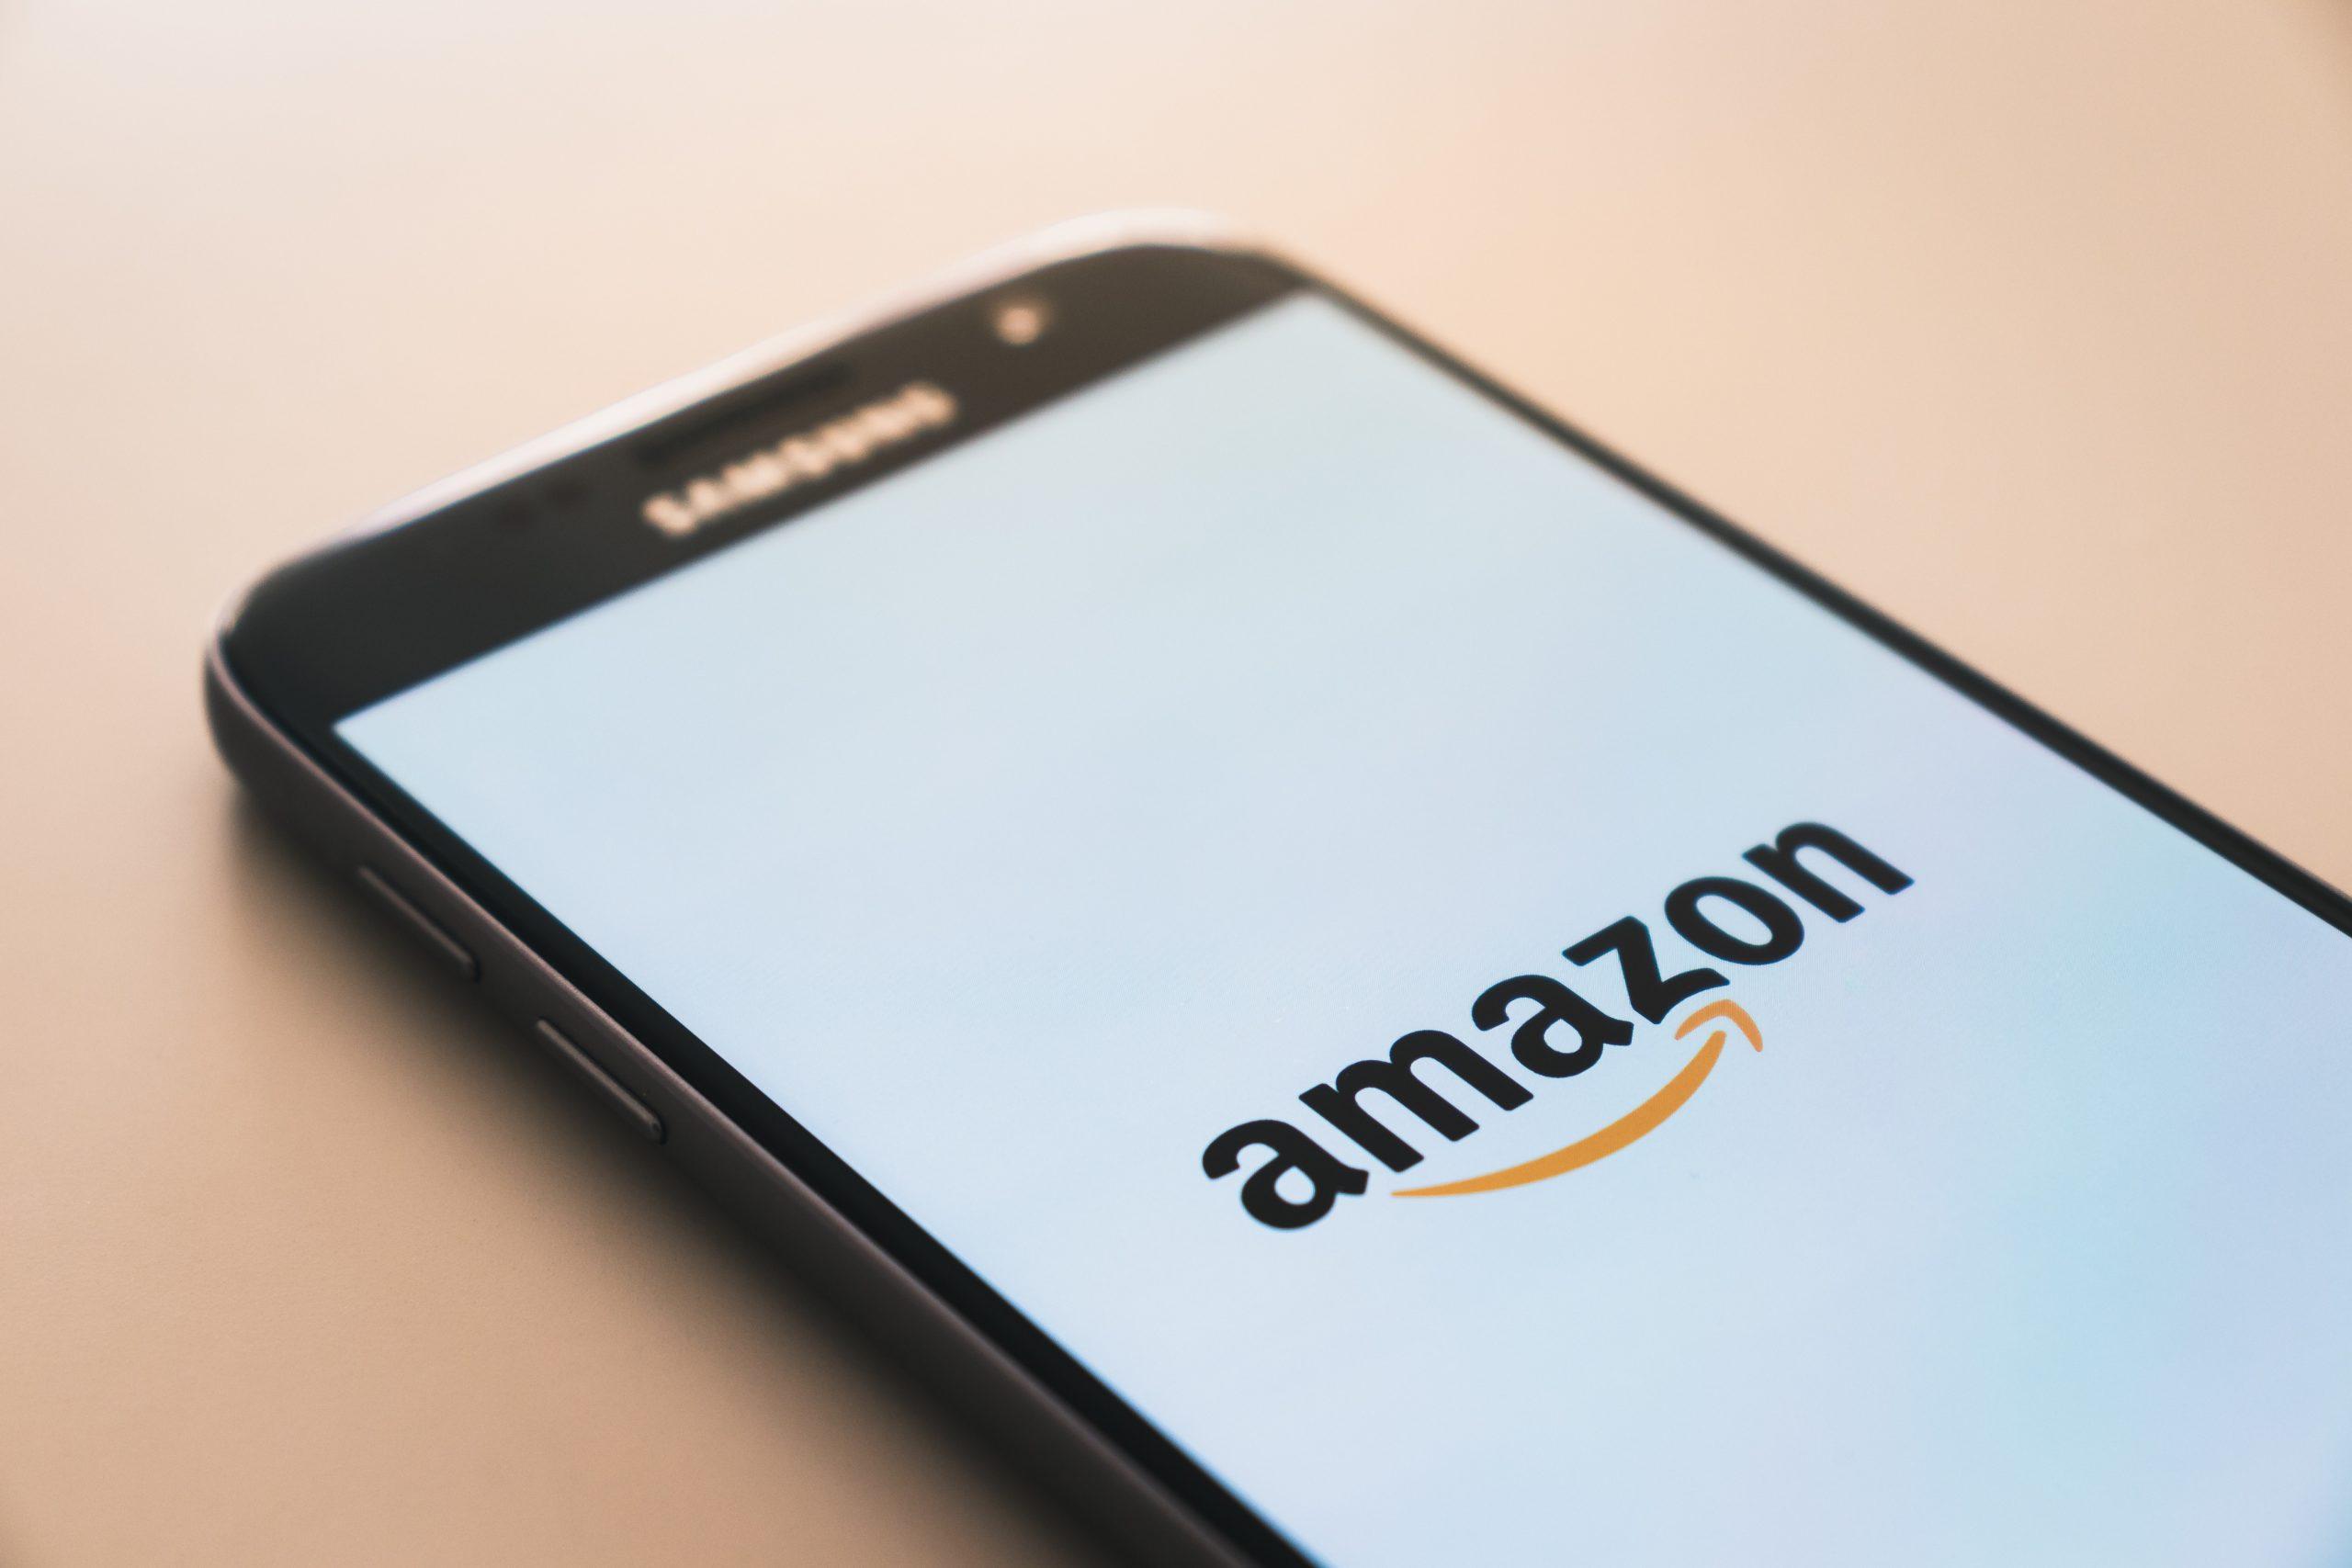 black Samsung Galaxy smartphone displaying Amazon logo